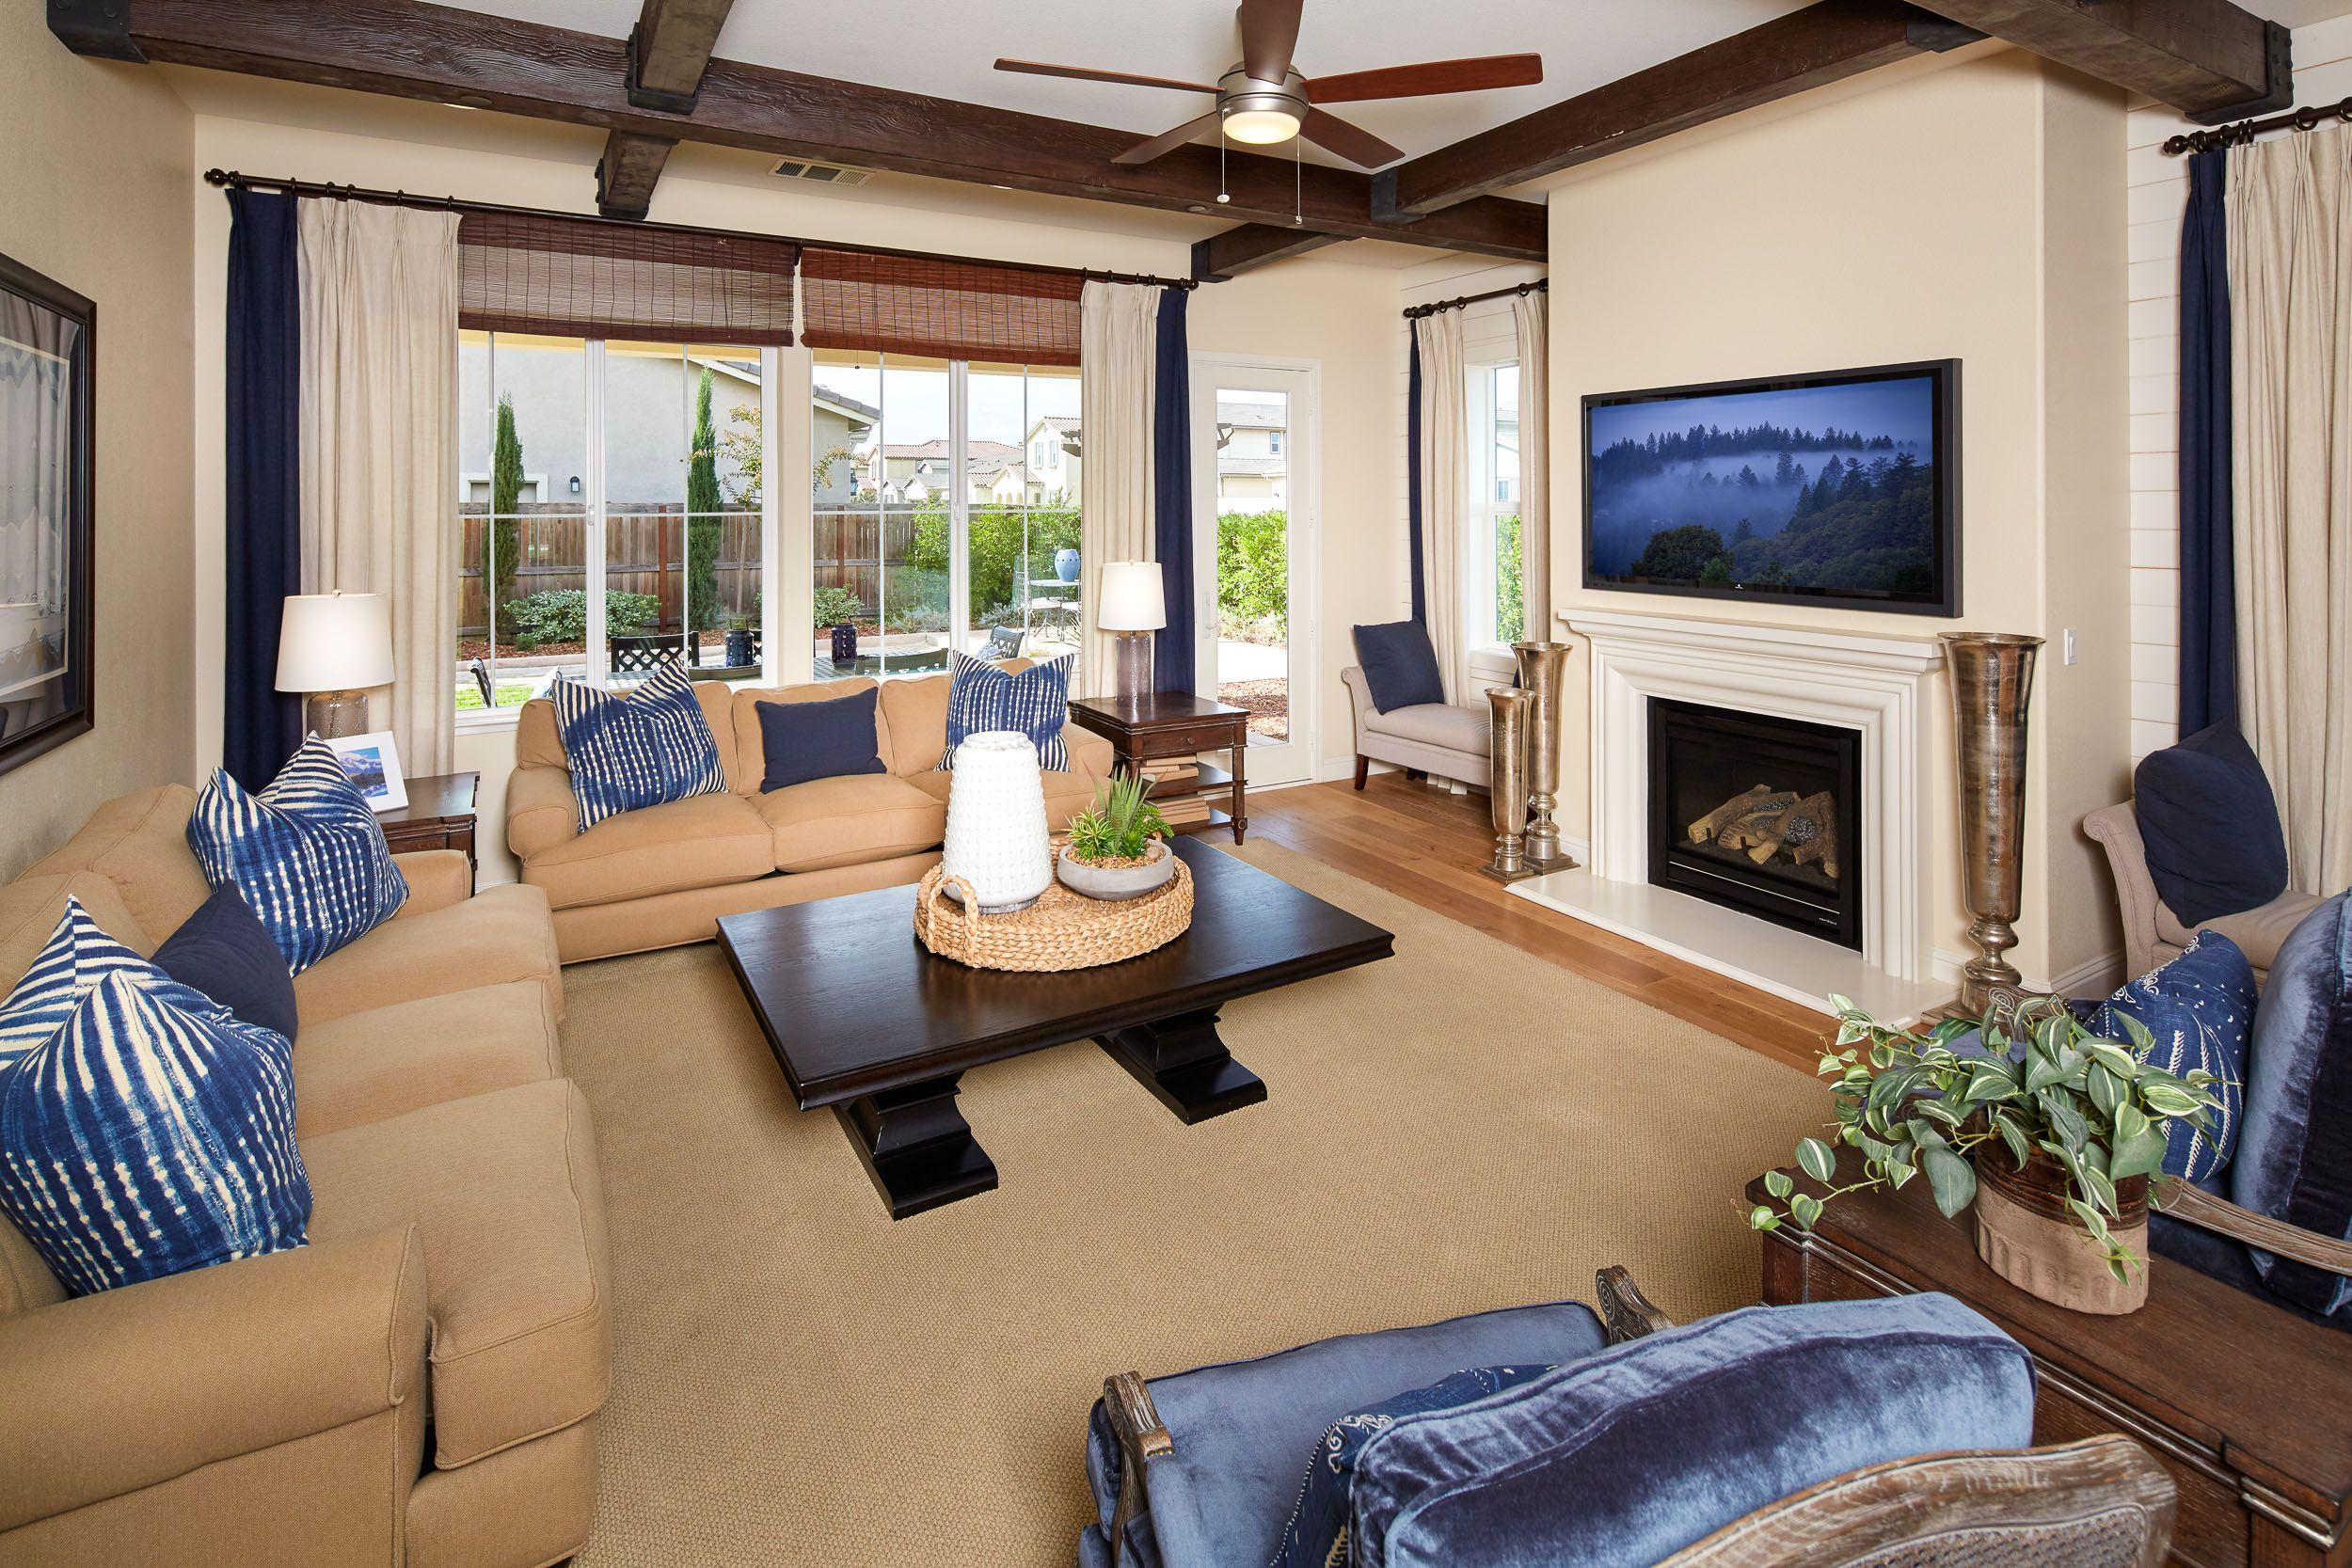 Add A Splash Of Color To Your Livingroom Fireplace Sacrealestate Homesforsale Interior Design New Homes Home